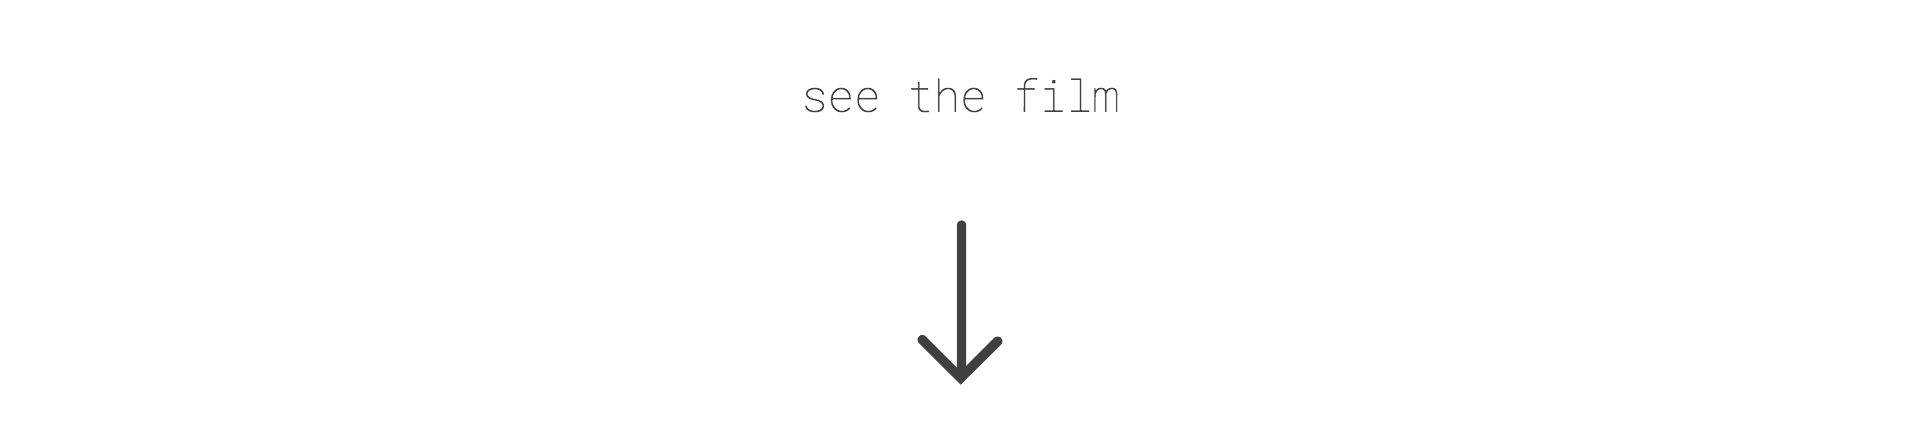 See film.png